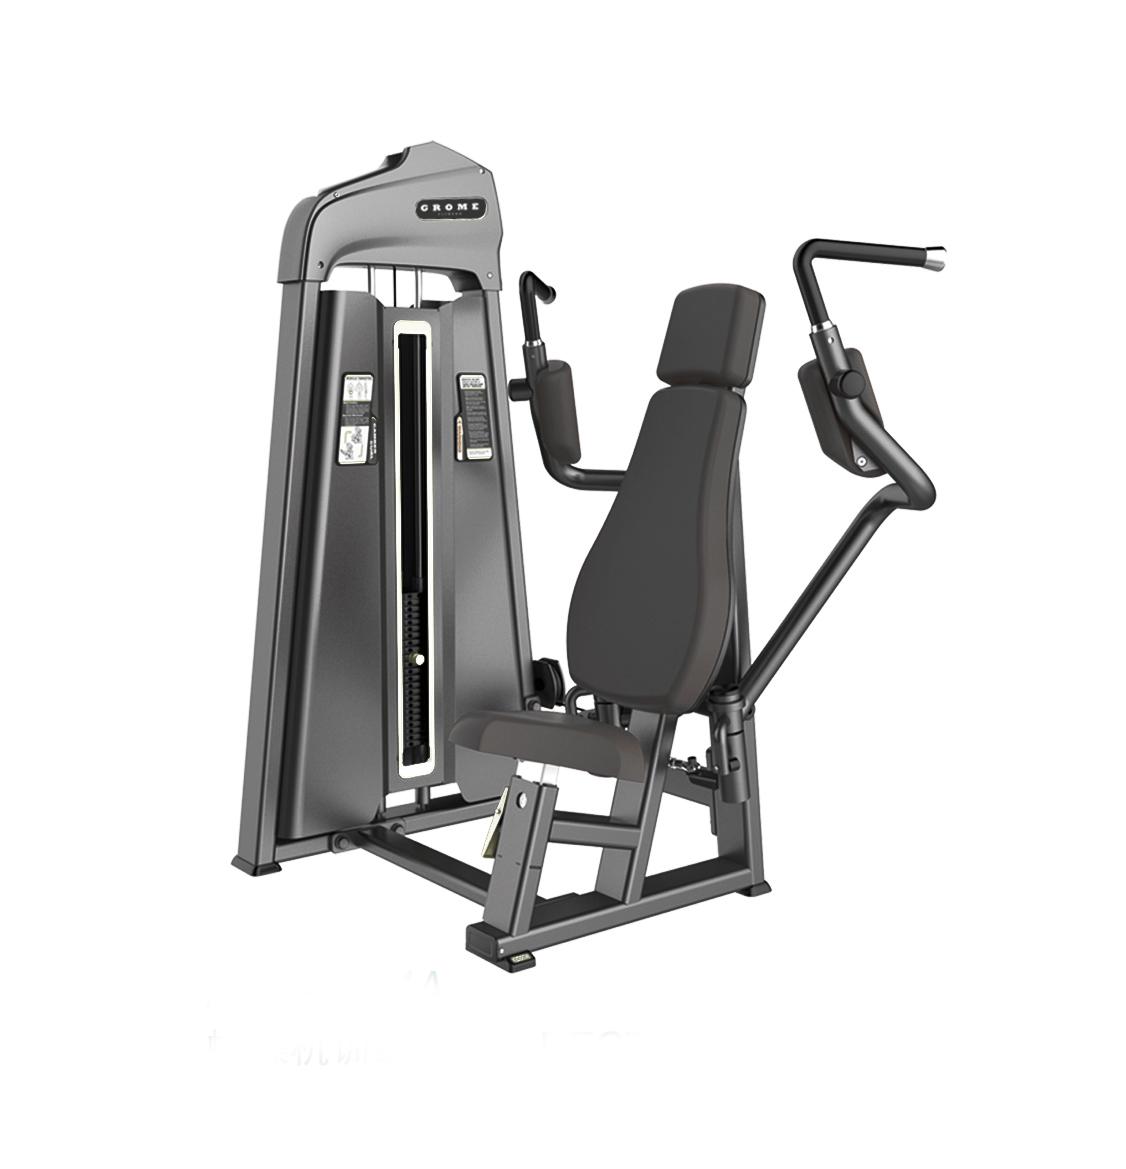 Тренажер GROME Fitness AXD5004A Баттерфляй